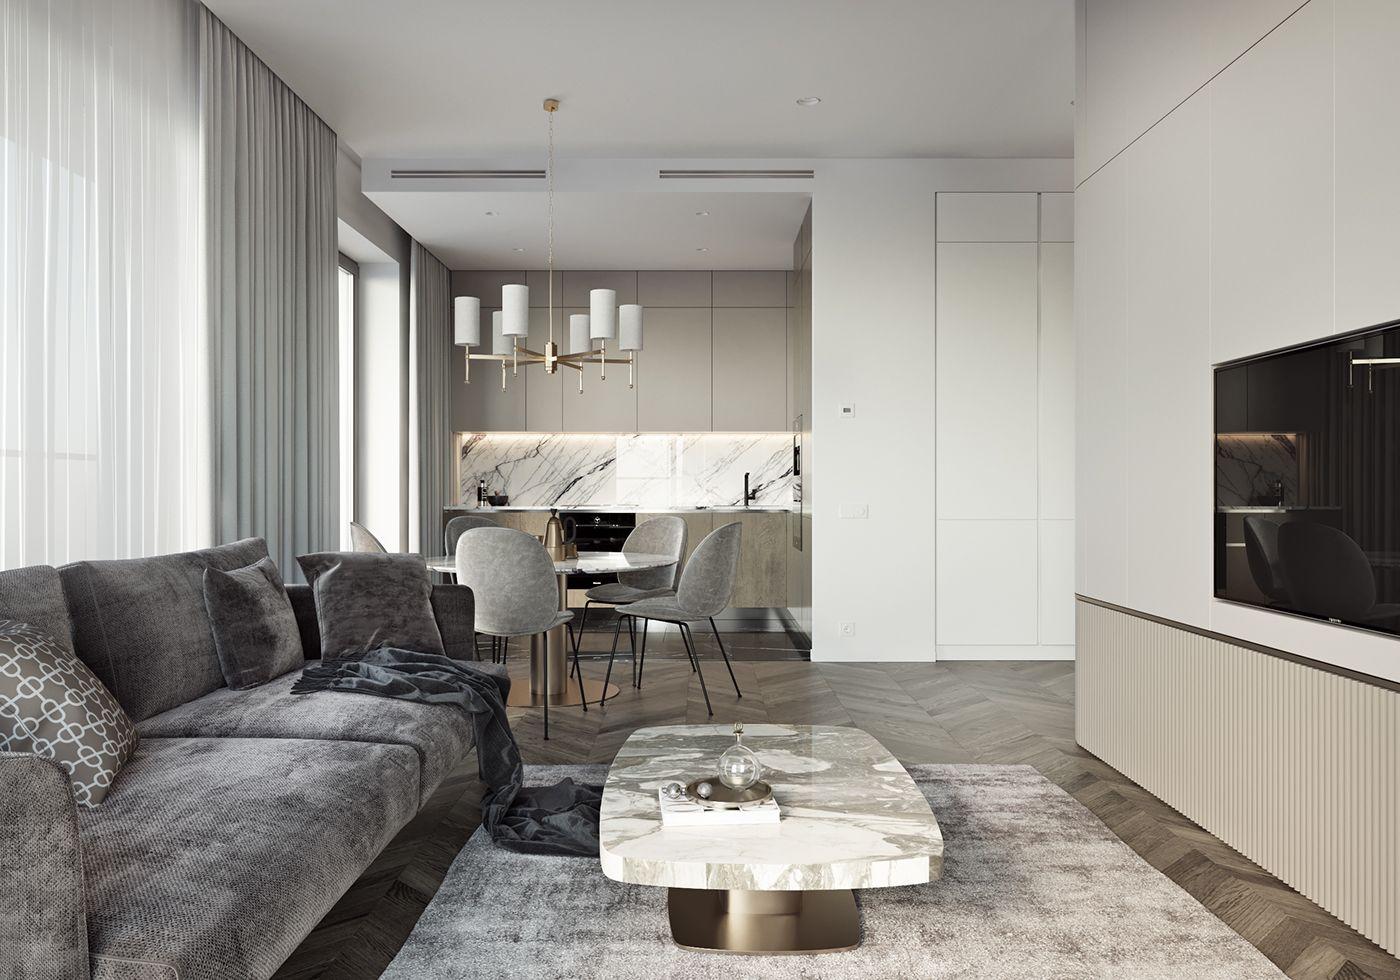 Pin By Lisetta On Apartament Foksal Small Modern Home Interior